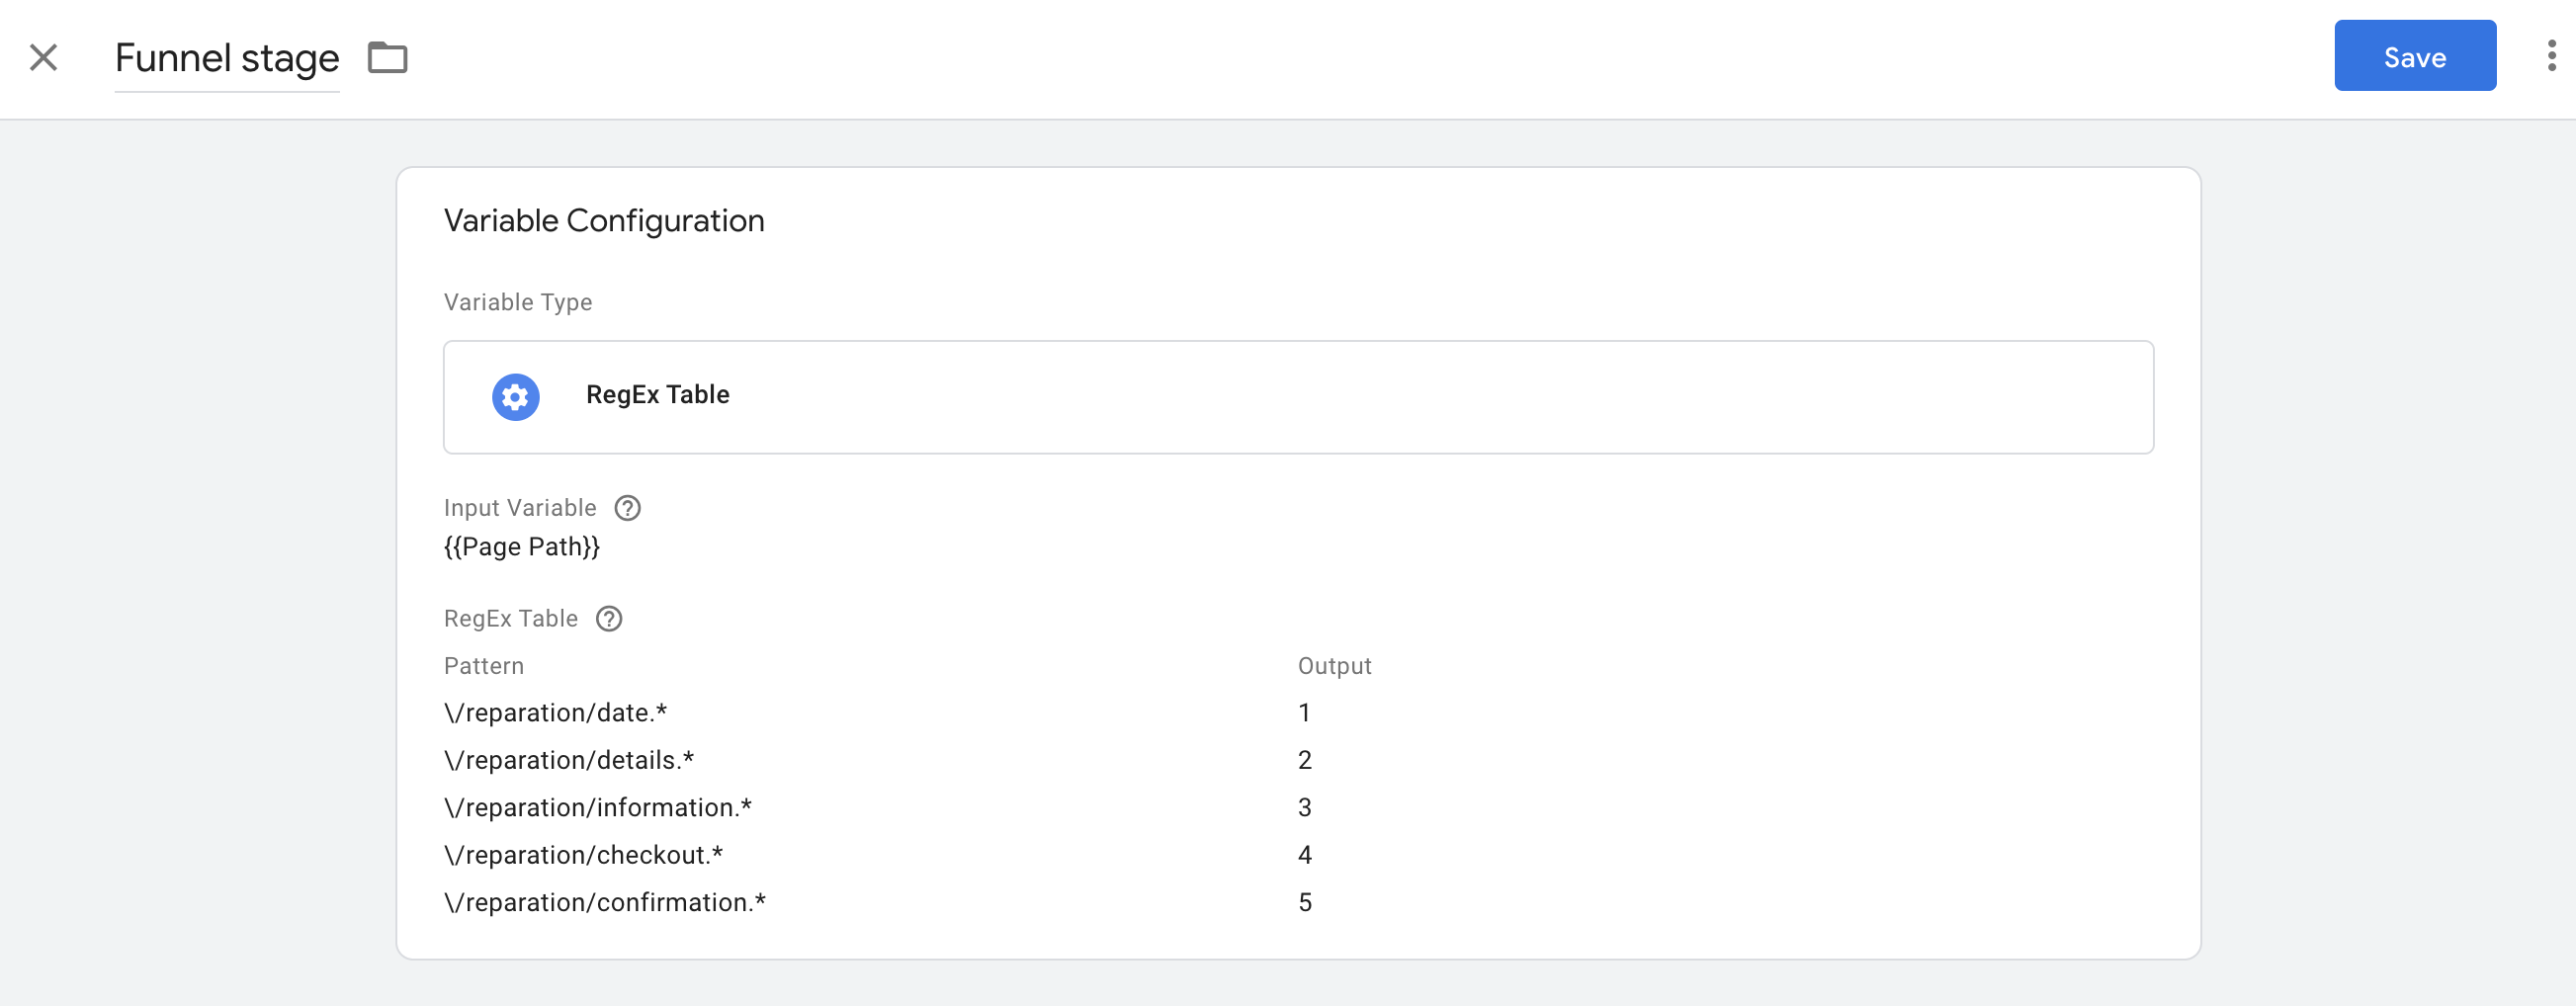 Screenshot 2020 11 09 at 16.16.47 | Custom metrics dans Google Analytics pour analyser un tunnel de conversion